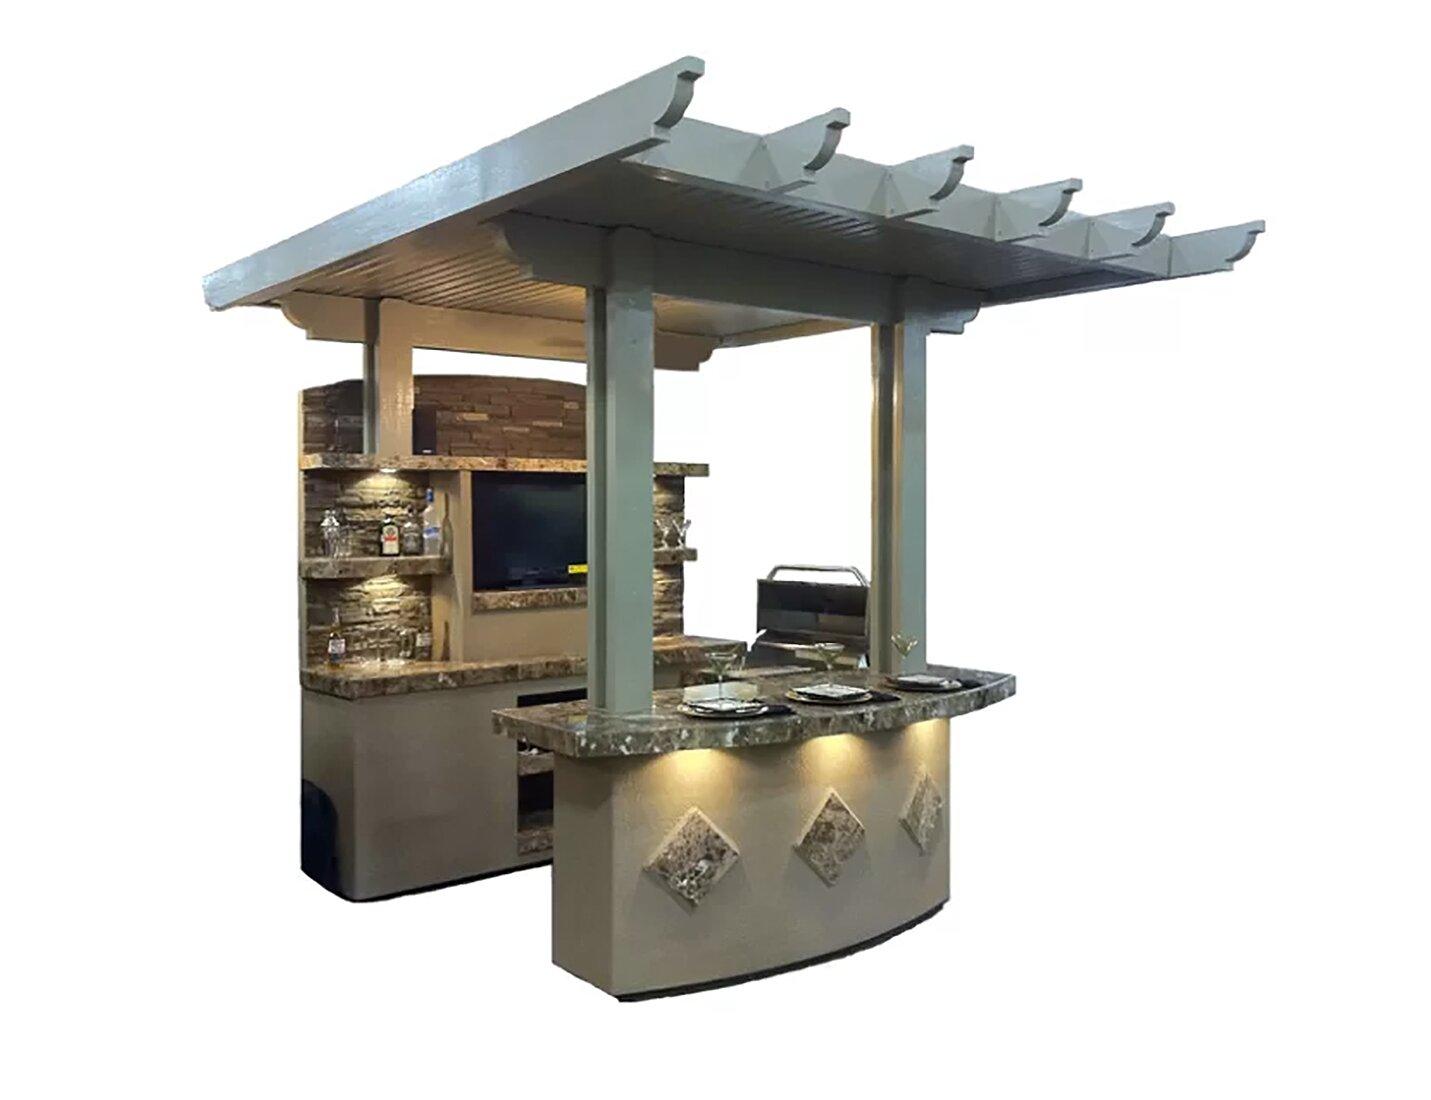 Details about Kokomo Grills St Croix BBQ 72\